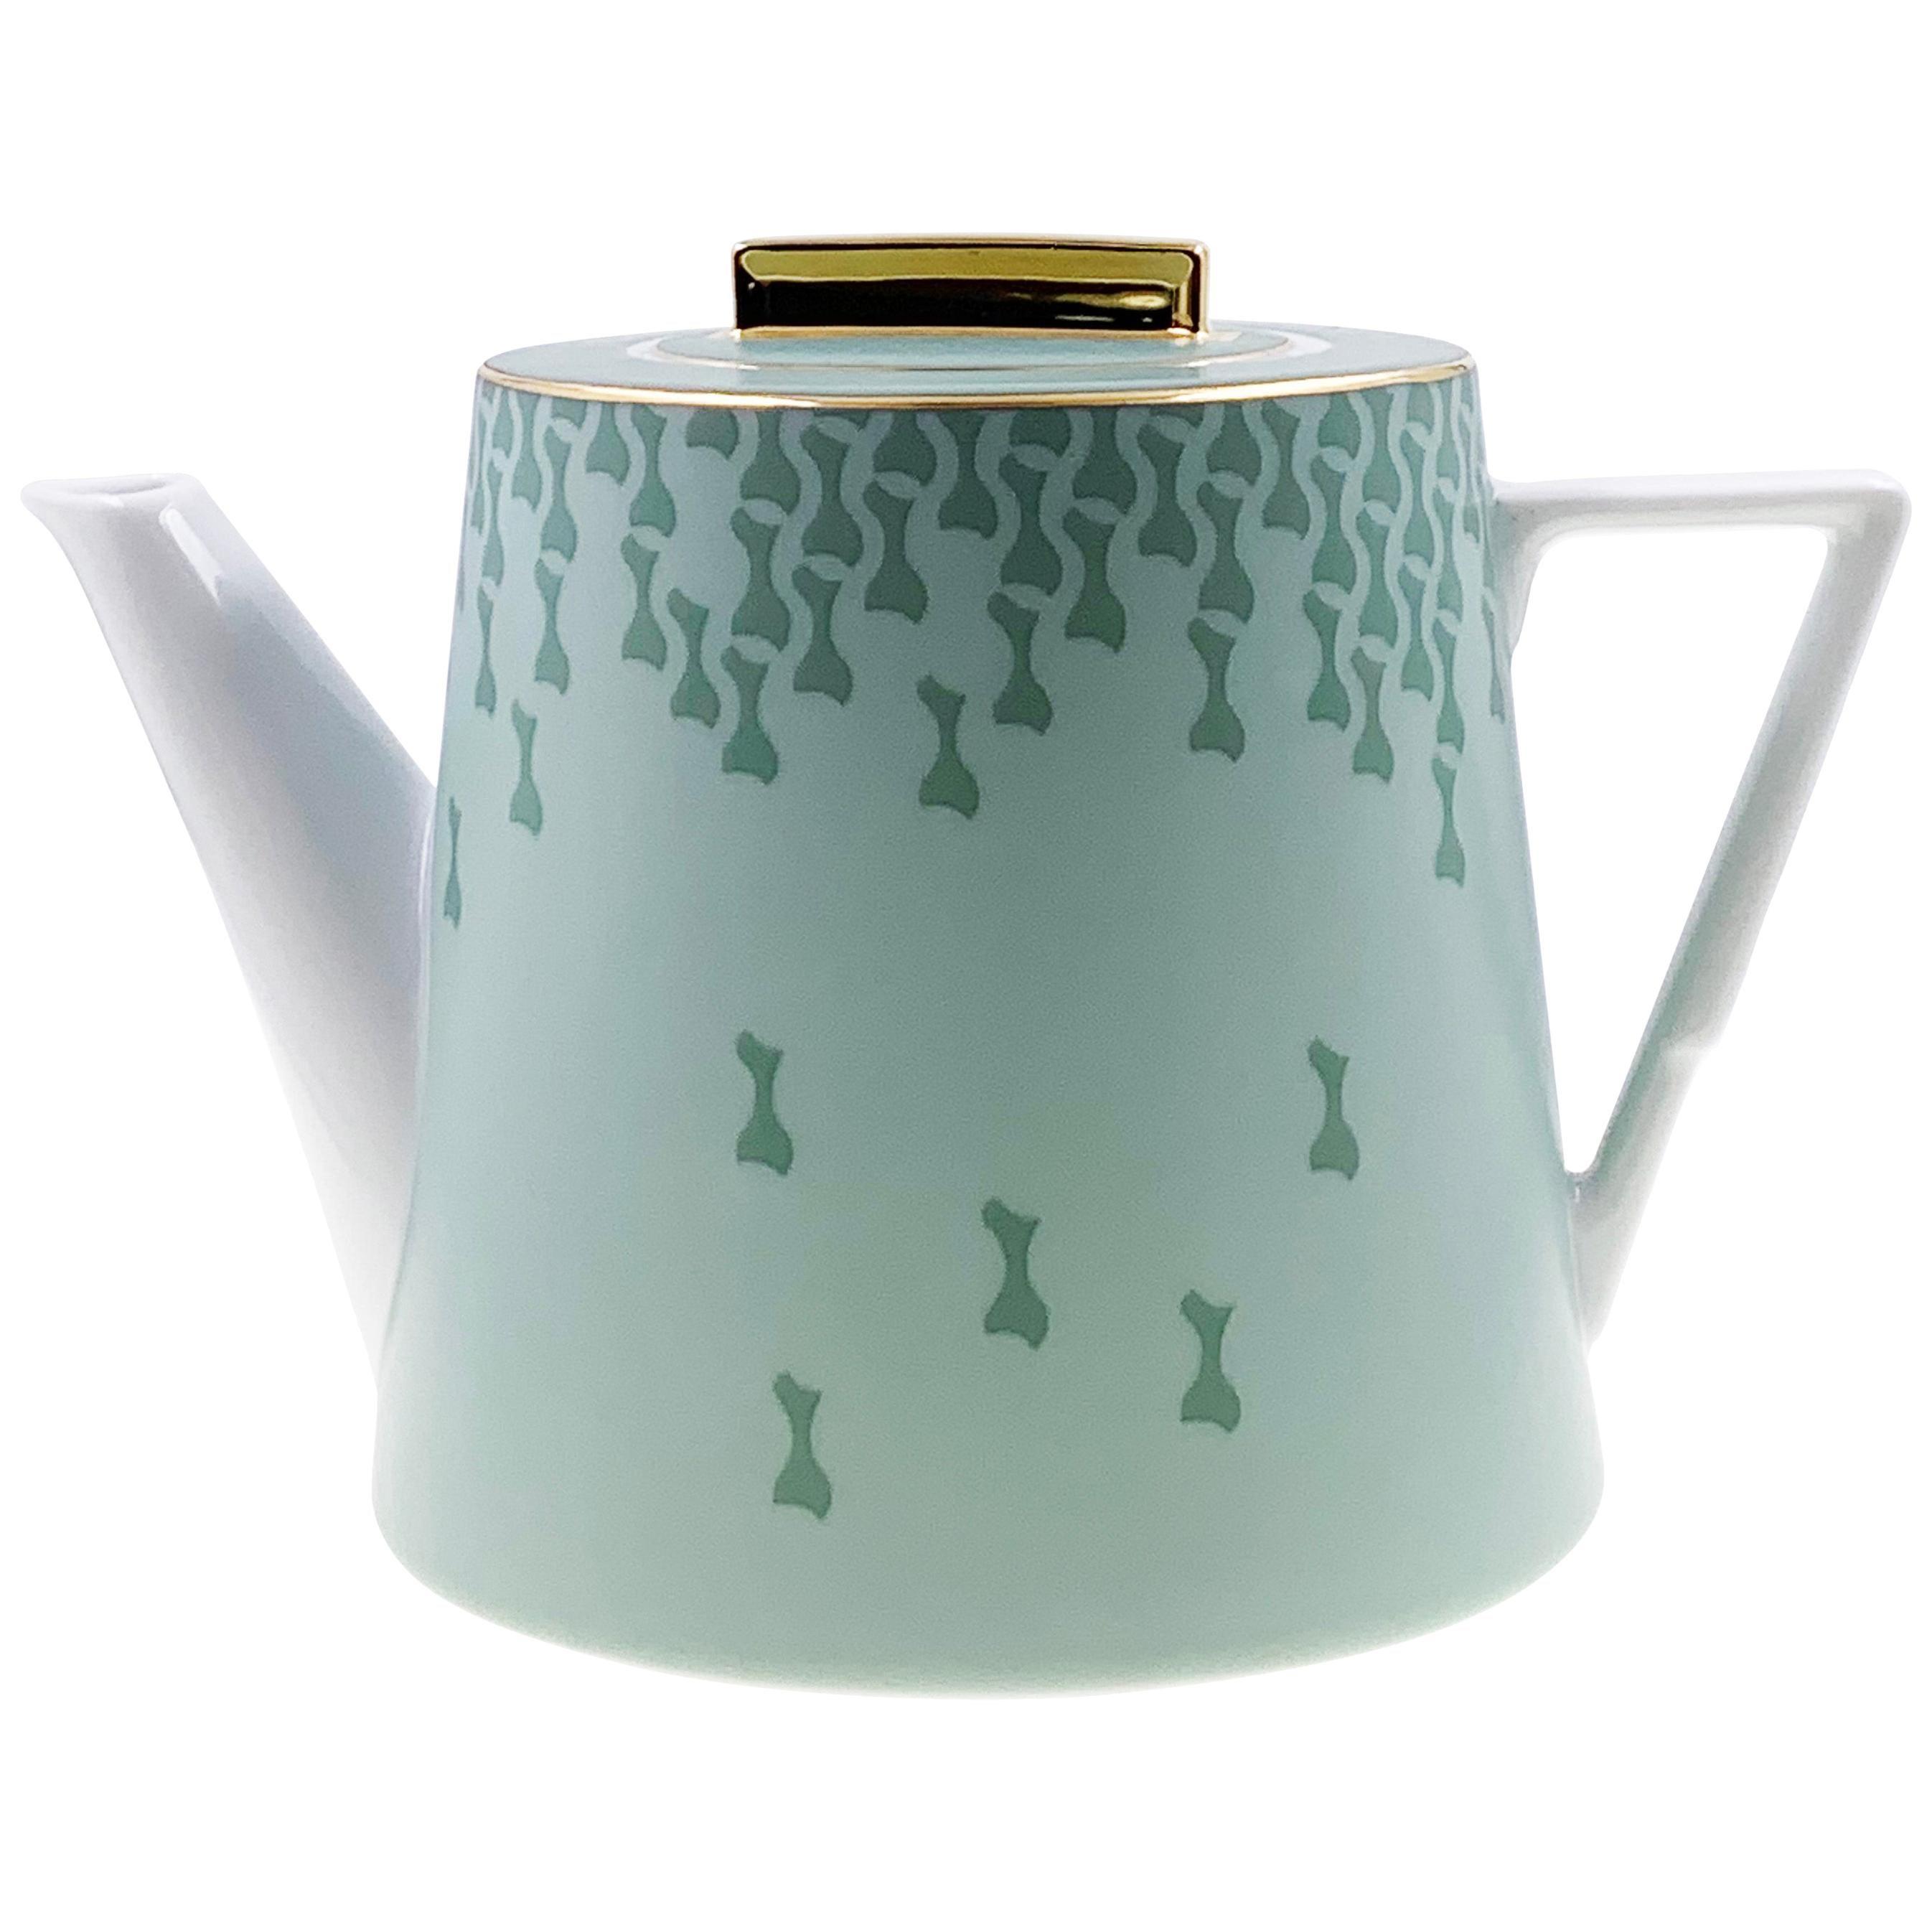 AF Tea Pot Mid Century Rhythm André Fu Living Tableware New